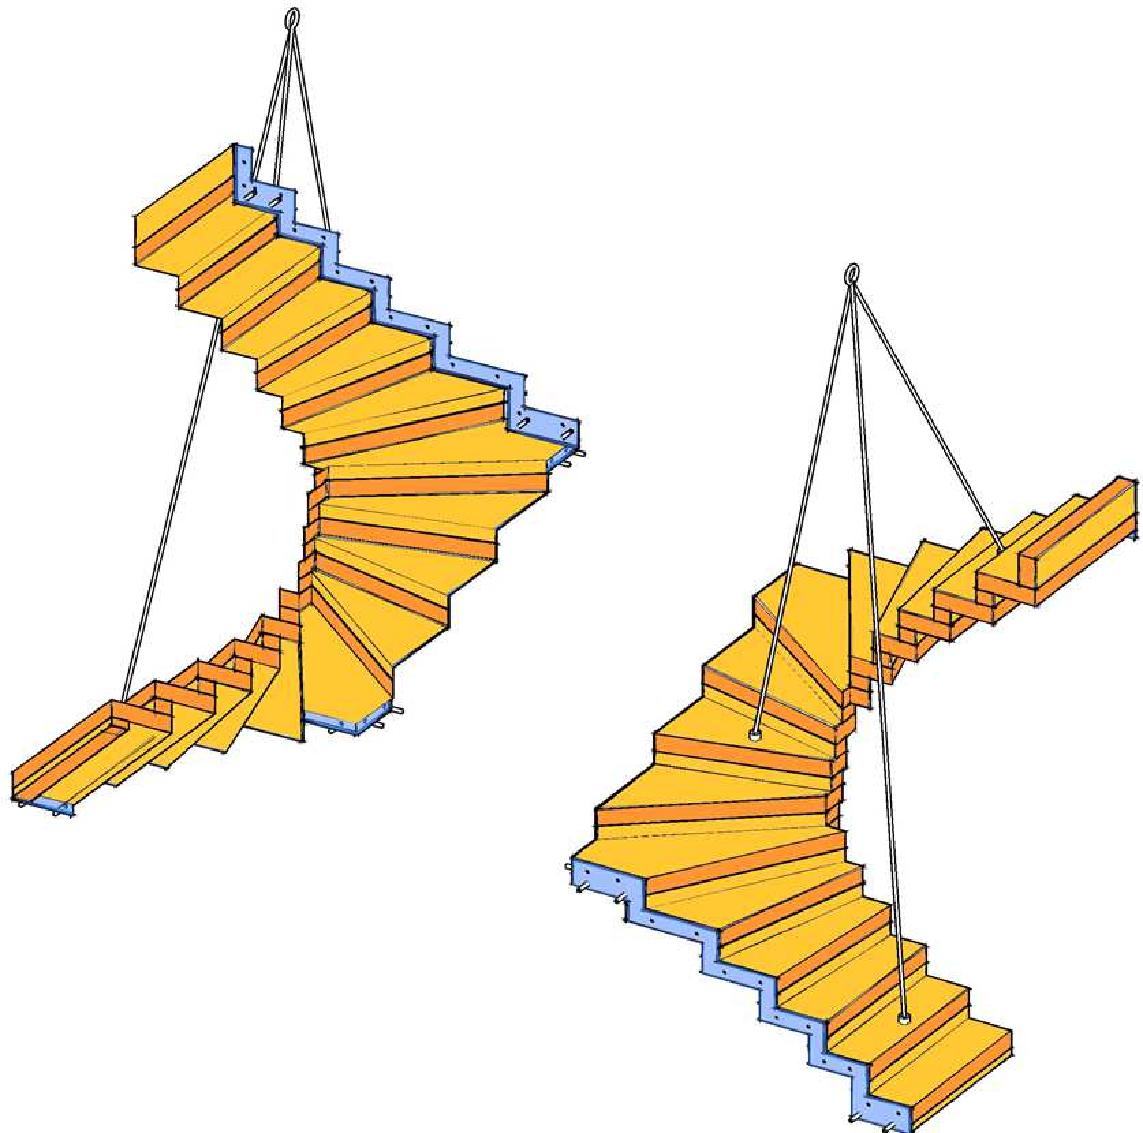 Halb gewendelte Faltwerk-Treppe aus Brettsperrholz